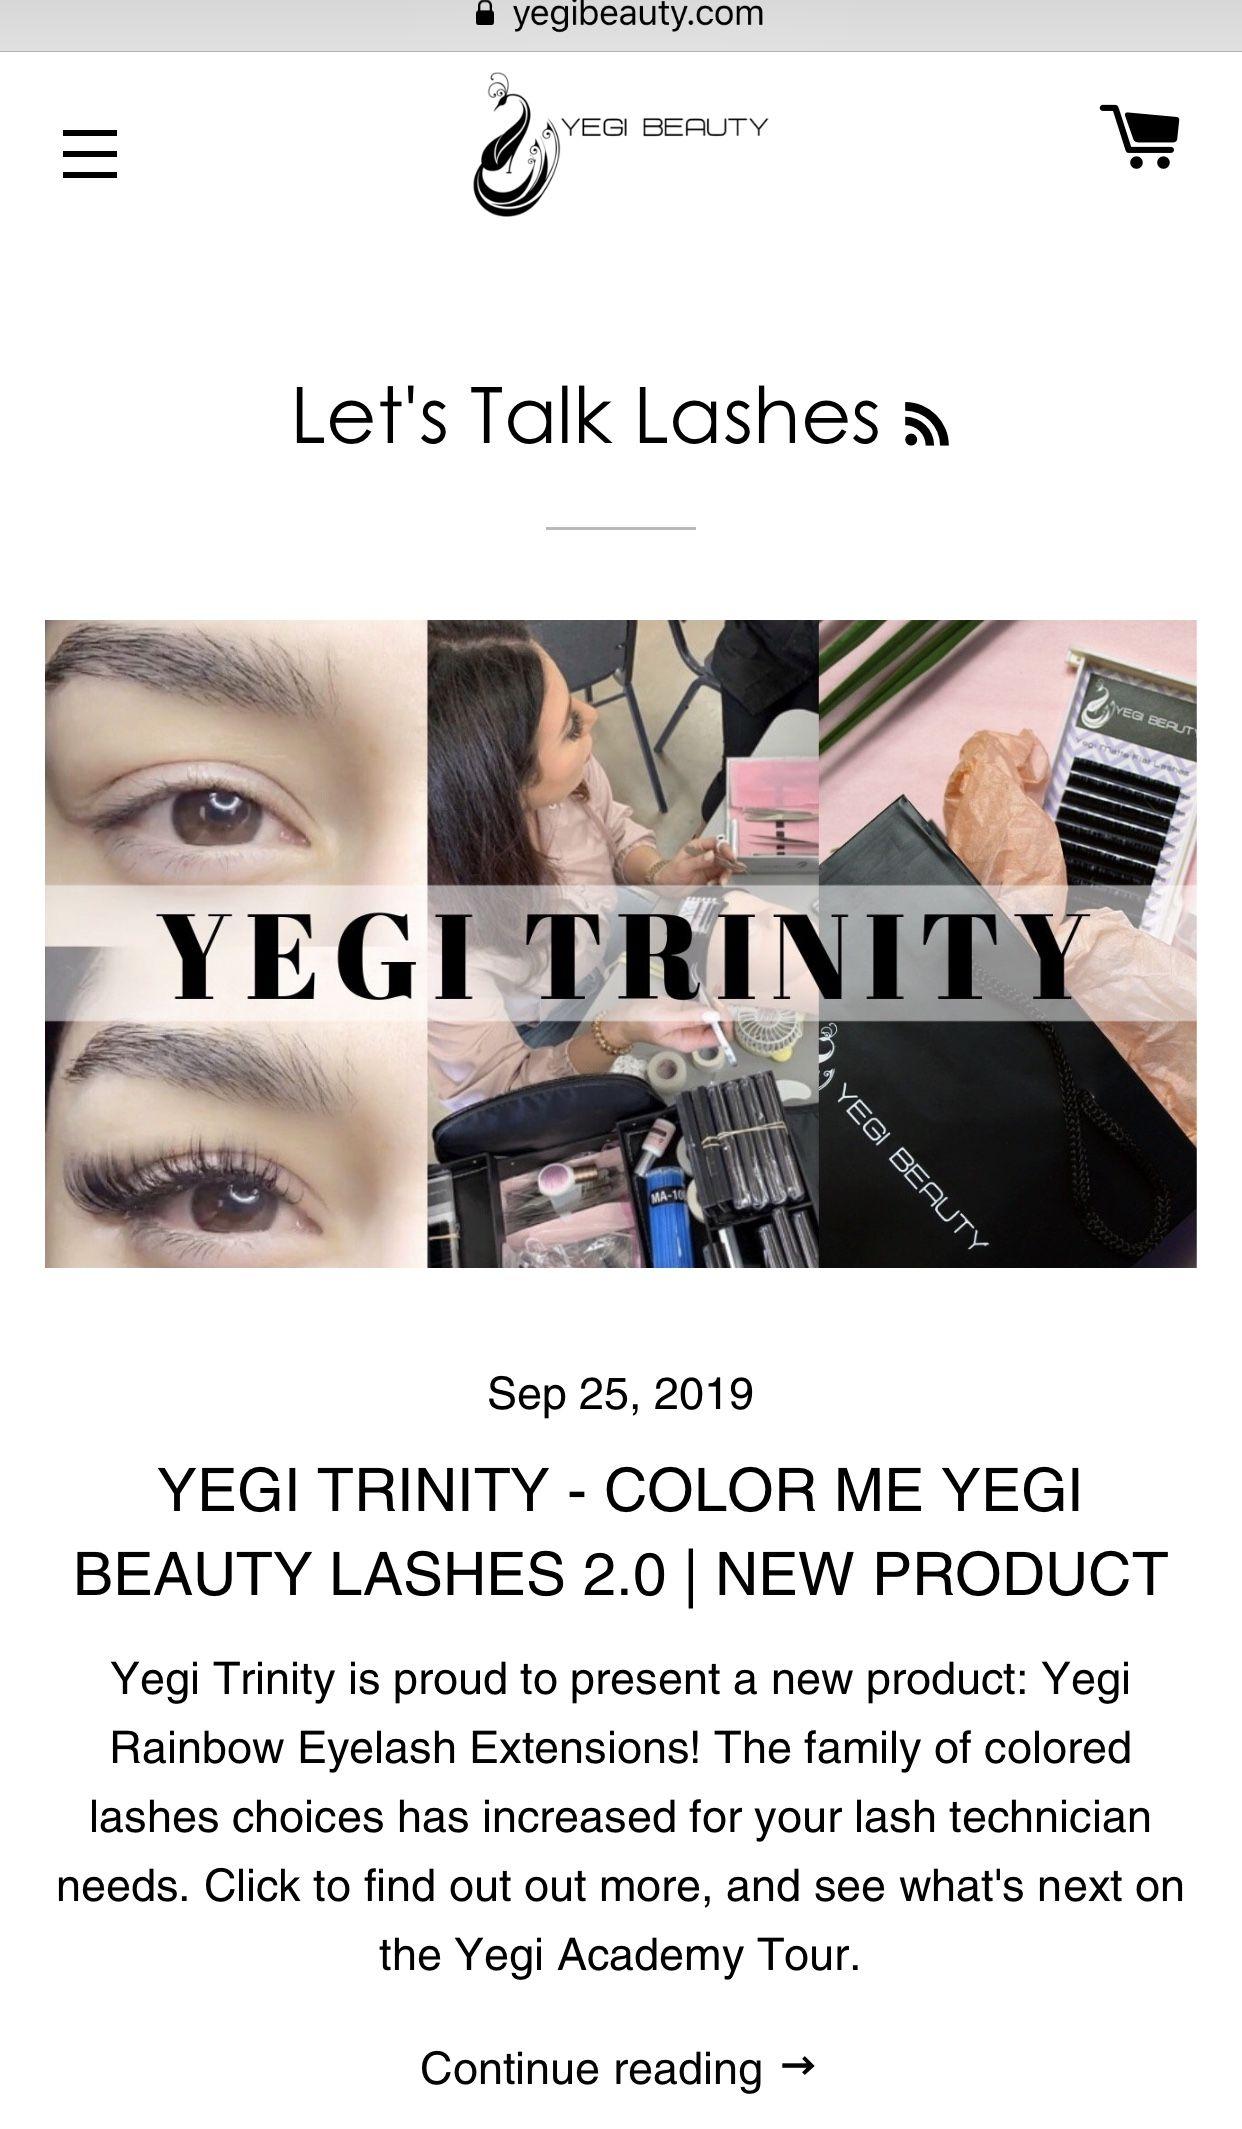 Color me yegi beauty lashes 20 eyelash extensions